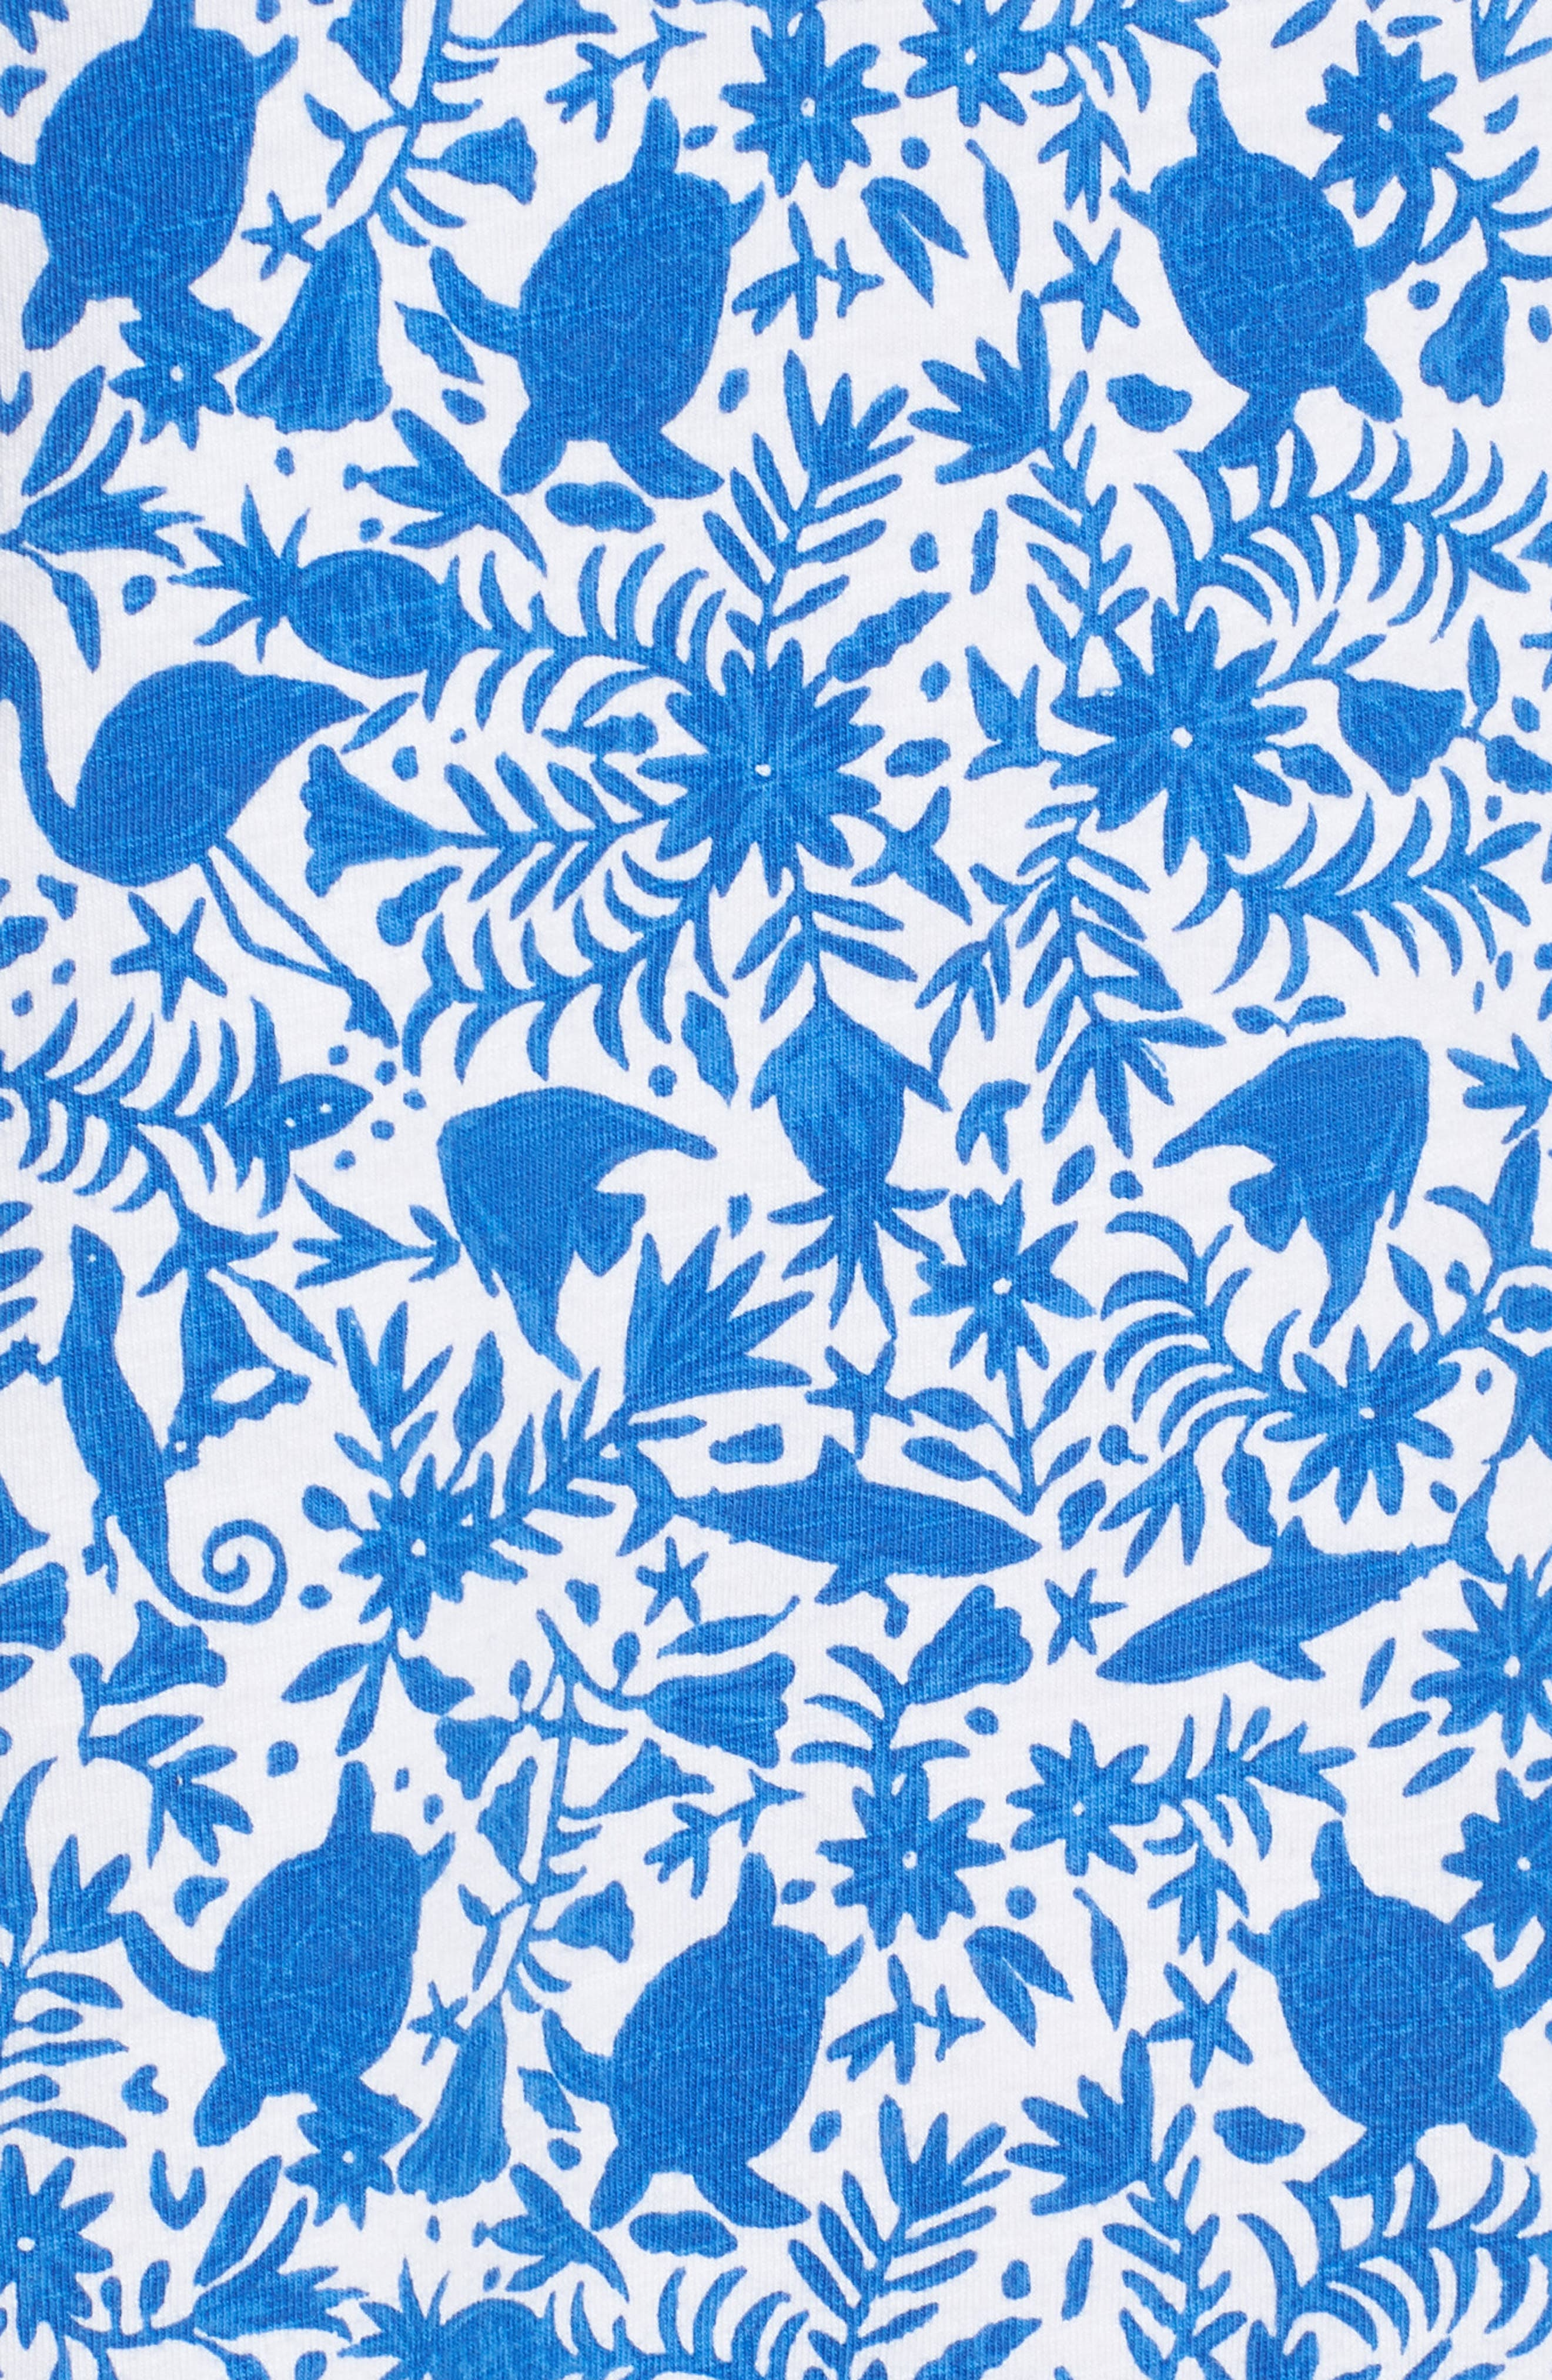 Bahamas Otomi Print Stretch Cotton Dress,                             Alternate thumbnail 5, color,                             413